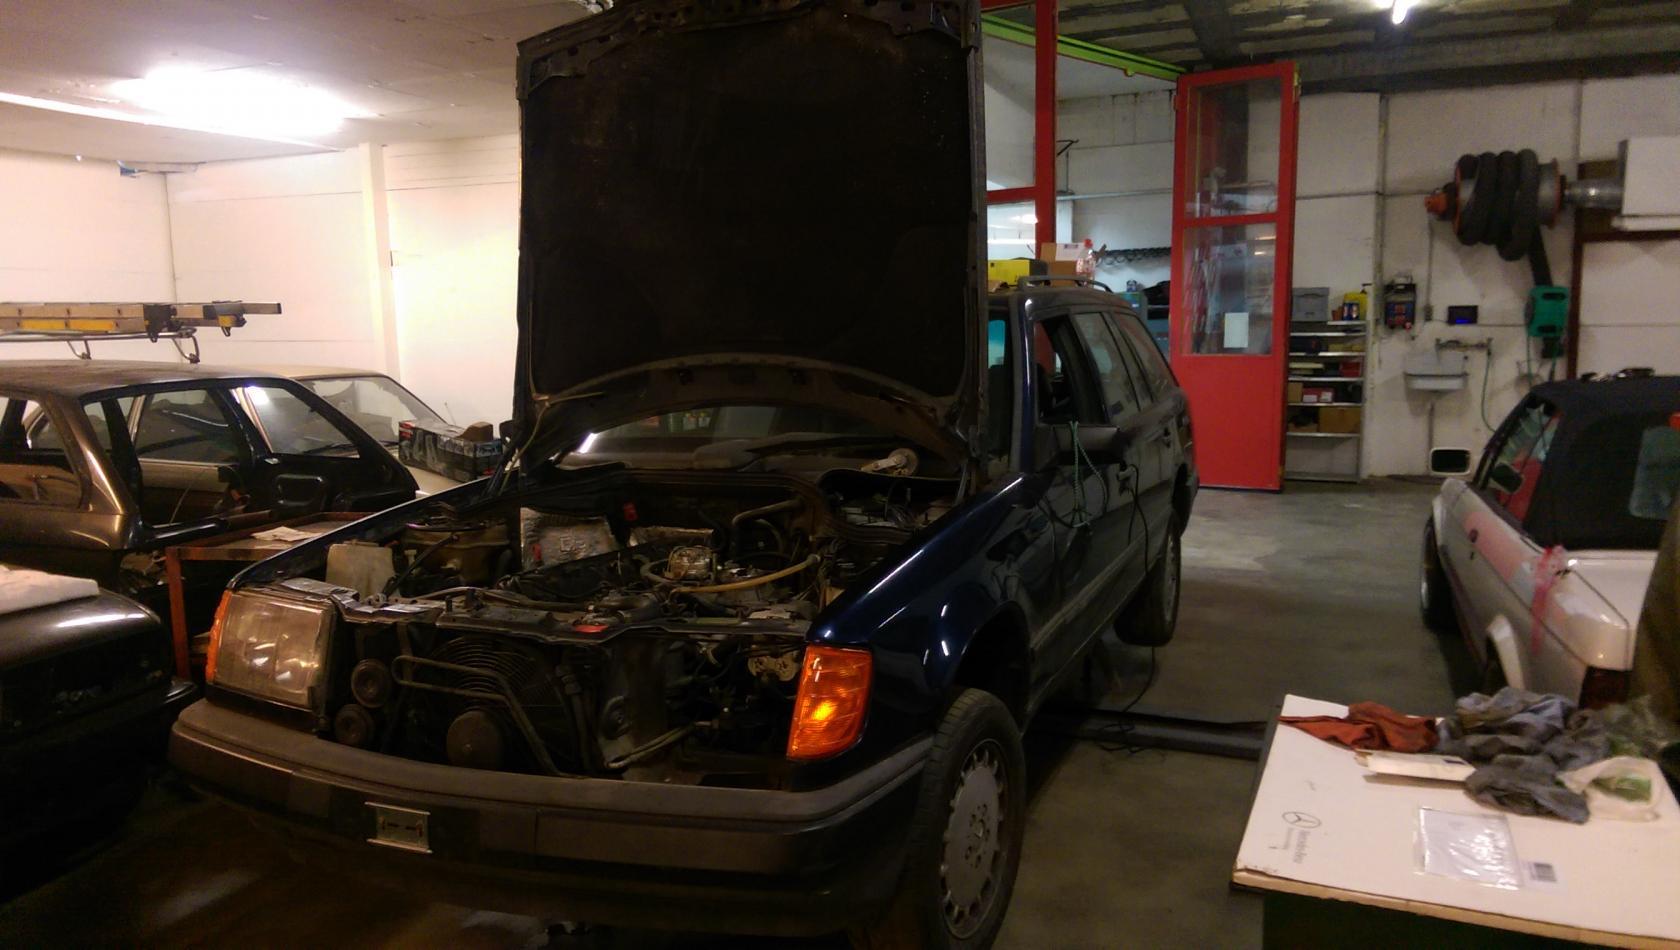 300 TE 4 Matic - W124